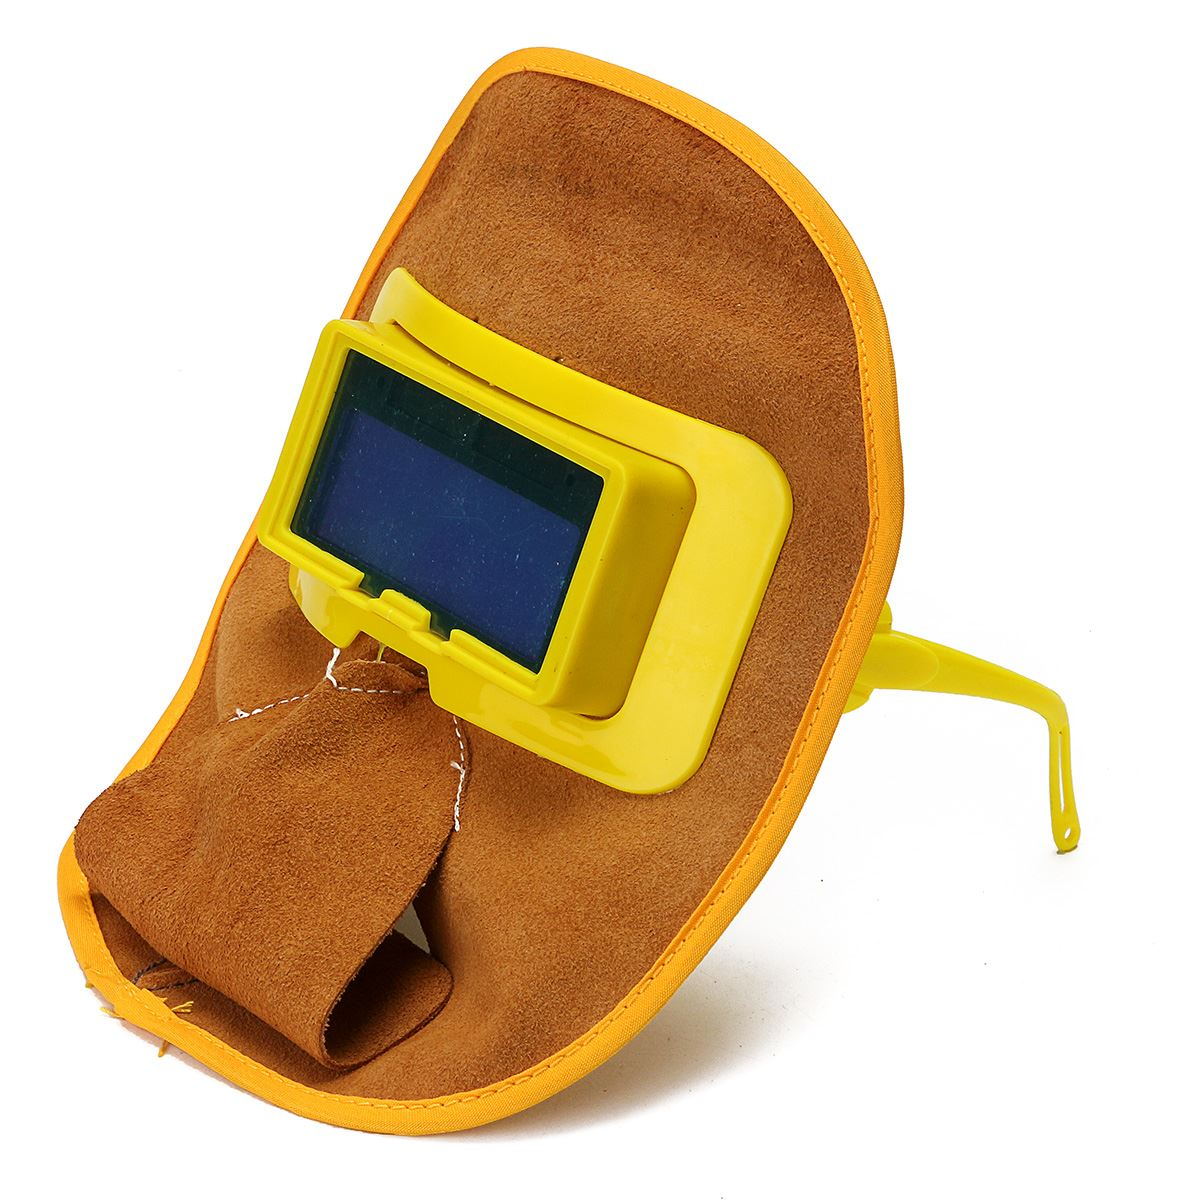 NEW Protable Leather Welding Solar Auto Darkening Filter Lens Hood Helmet Mask safety protective mask  цены